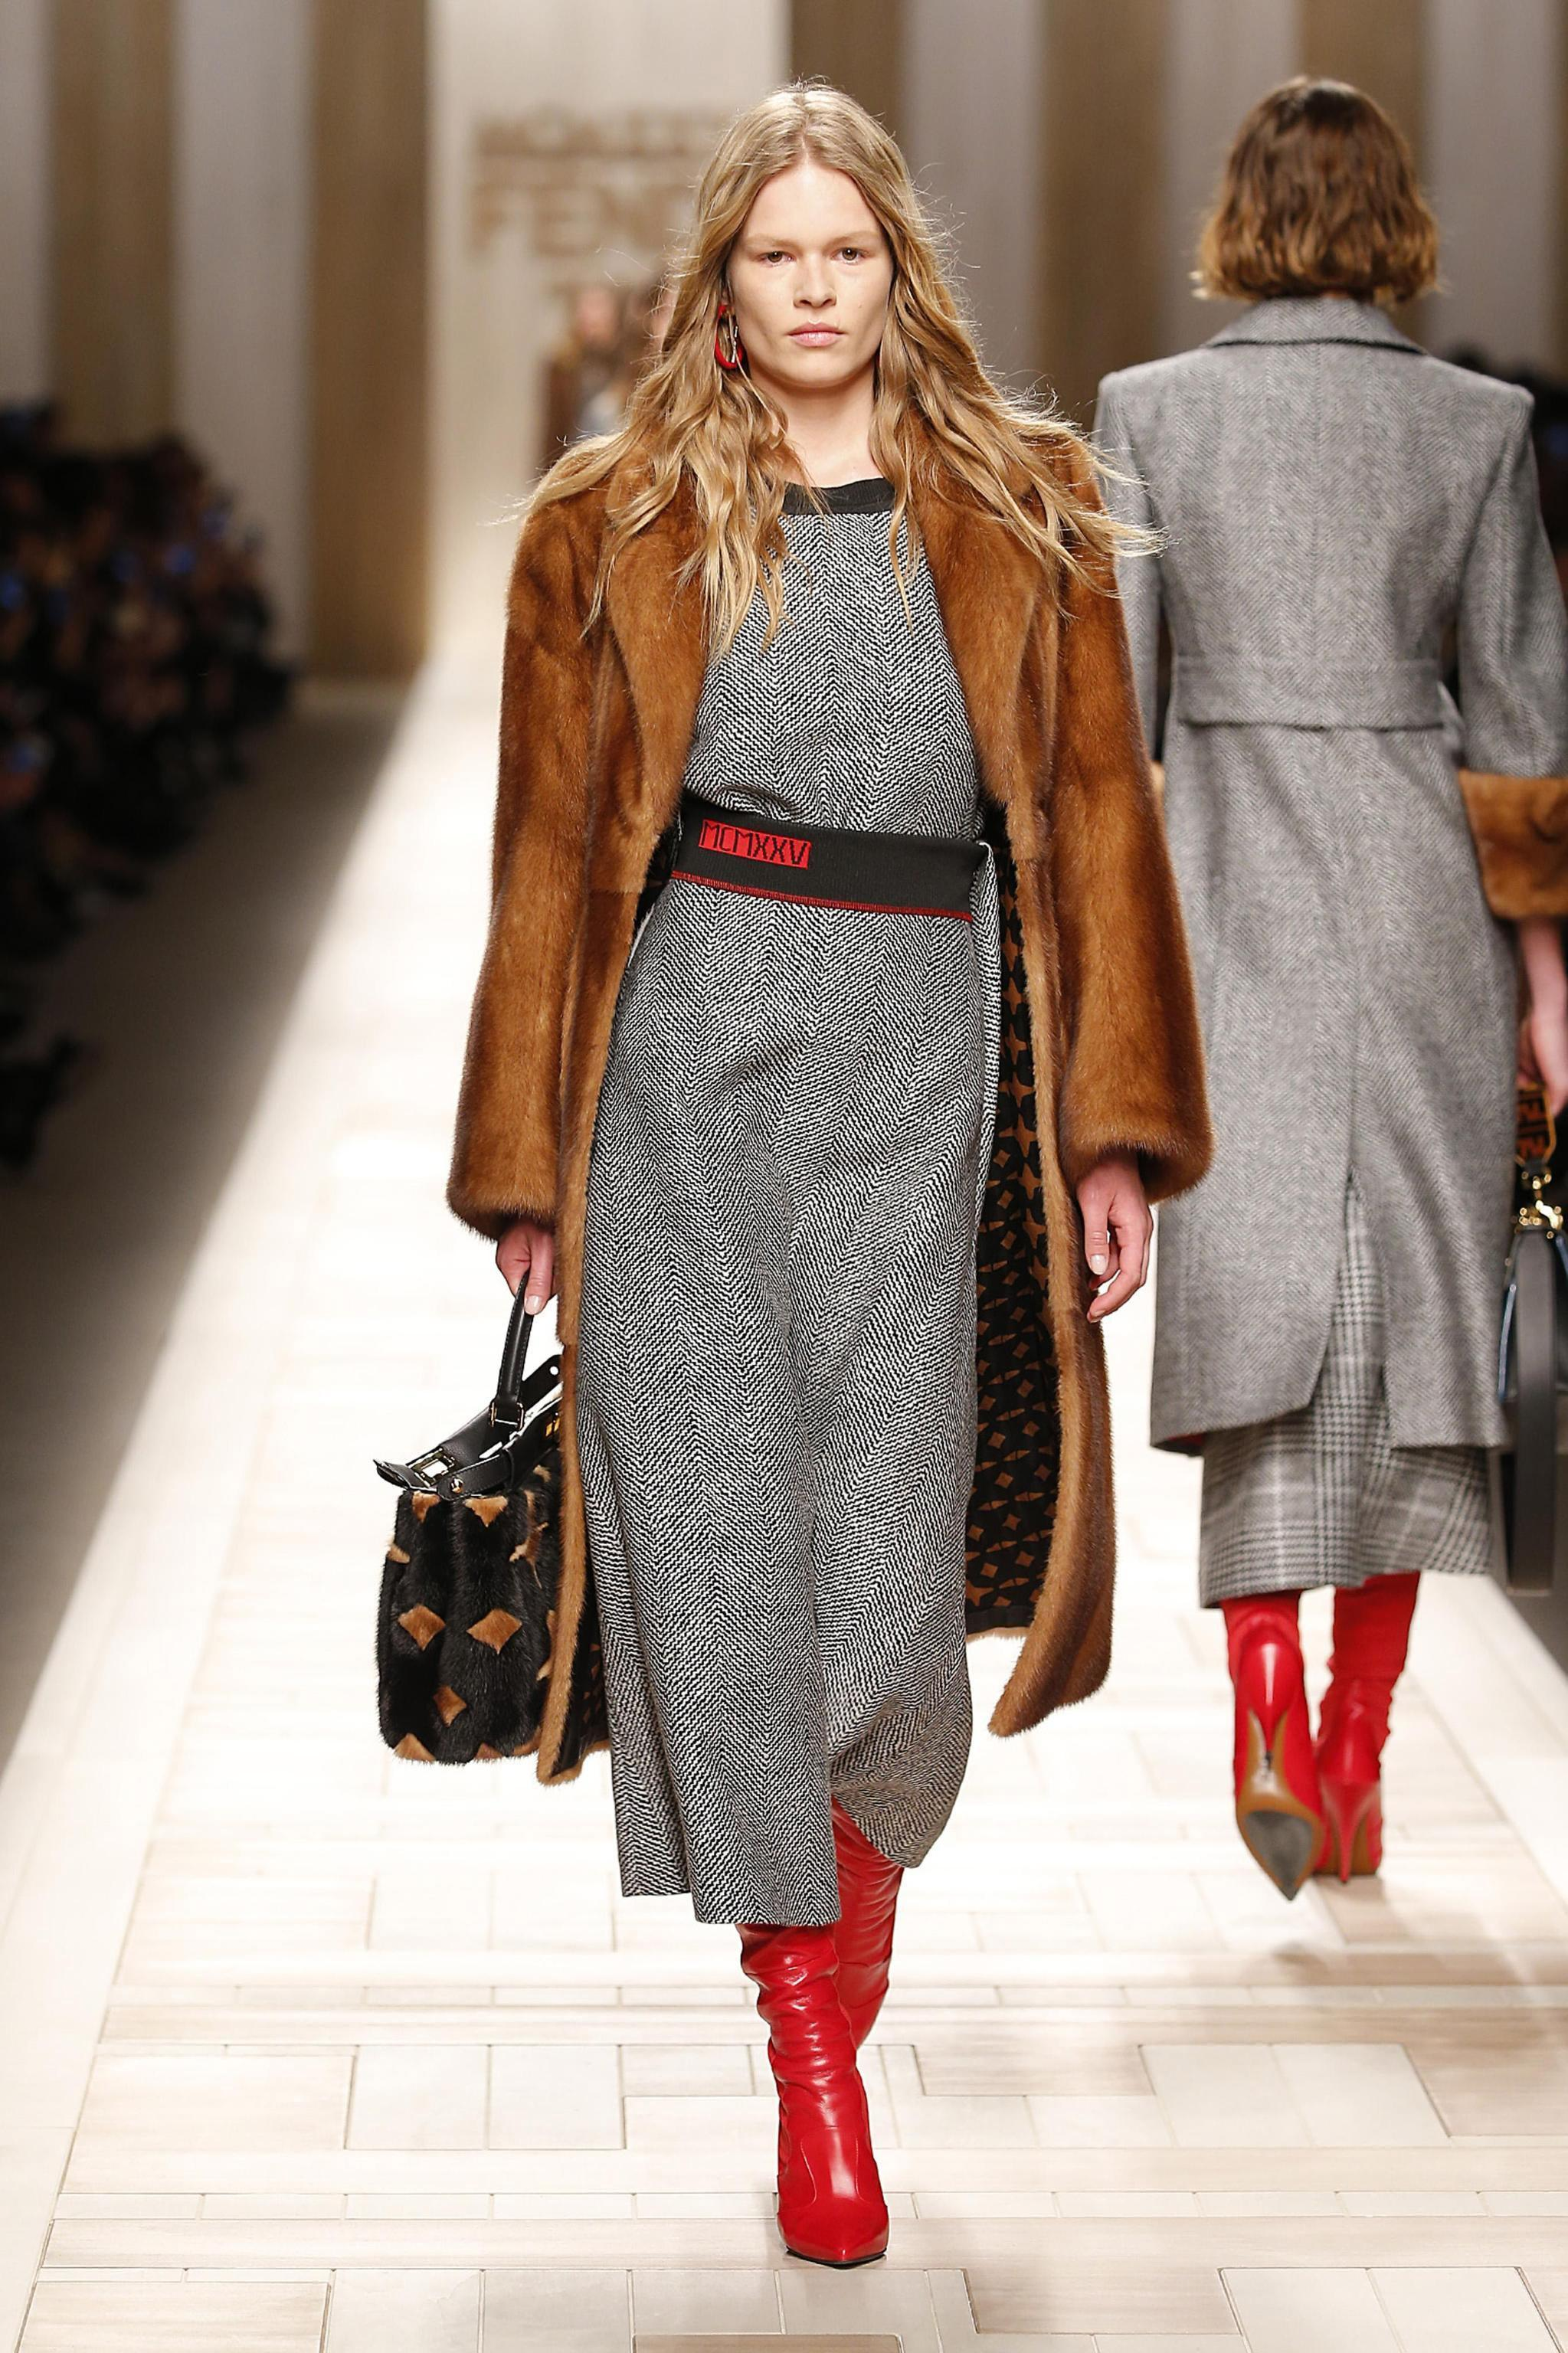 Fendi Runway Milan Fashion Week Women's Collections F/W 2017/2018